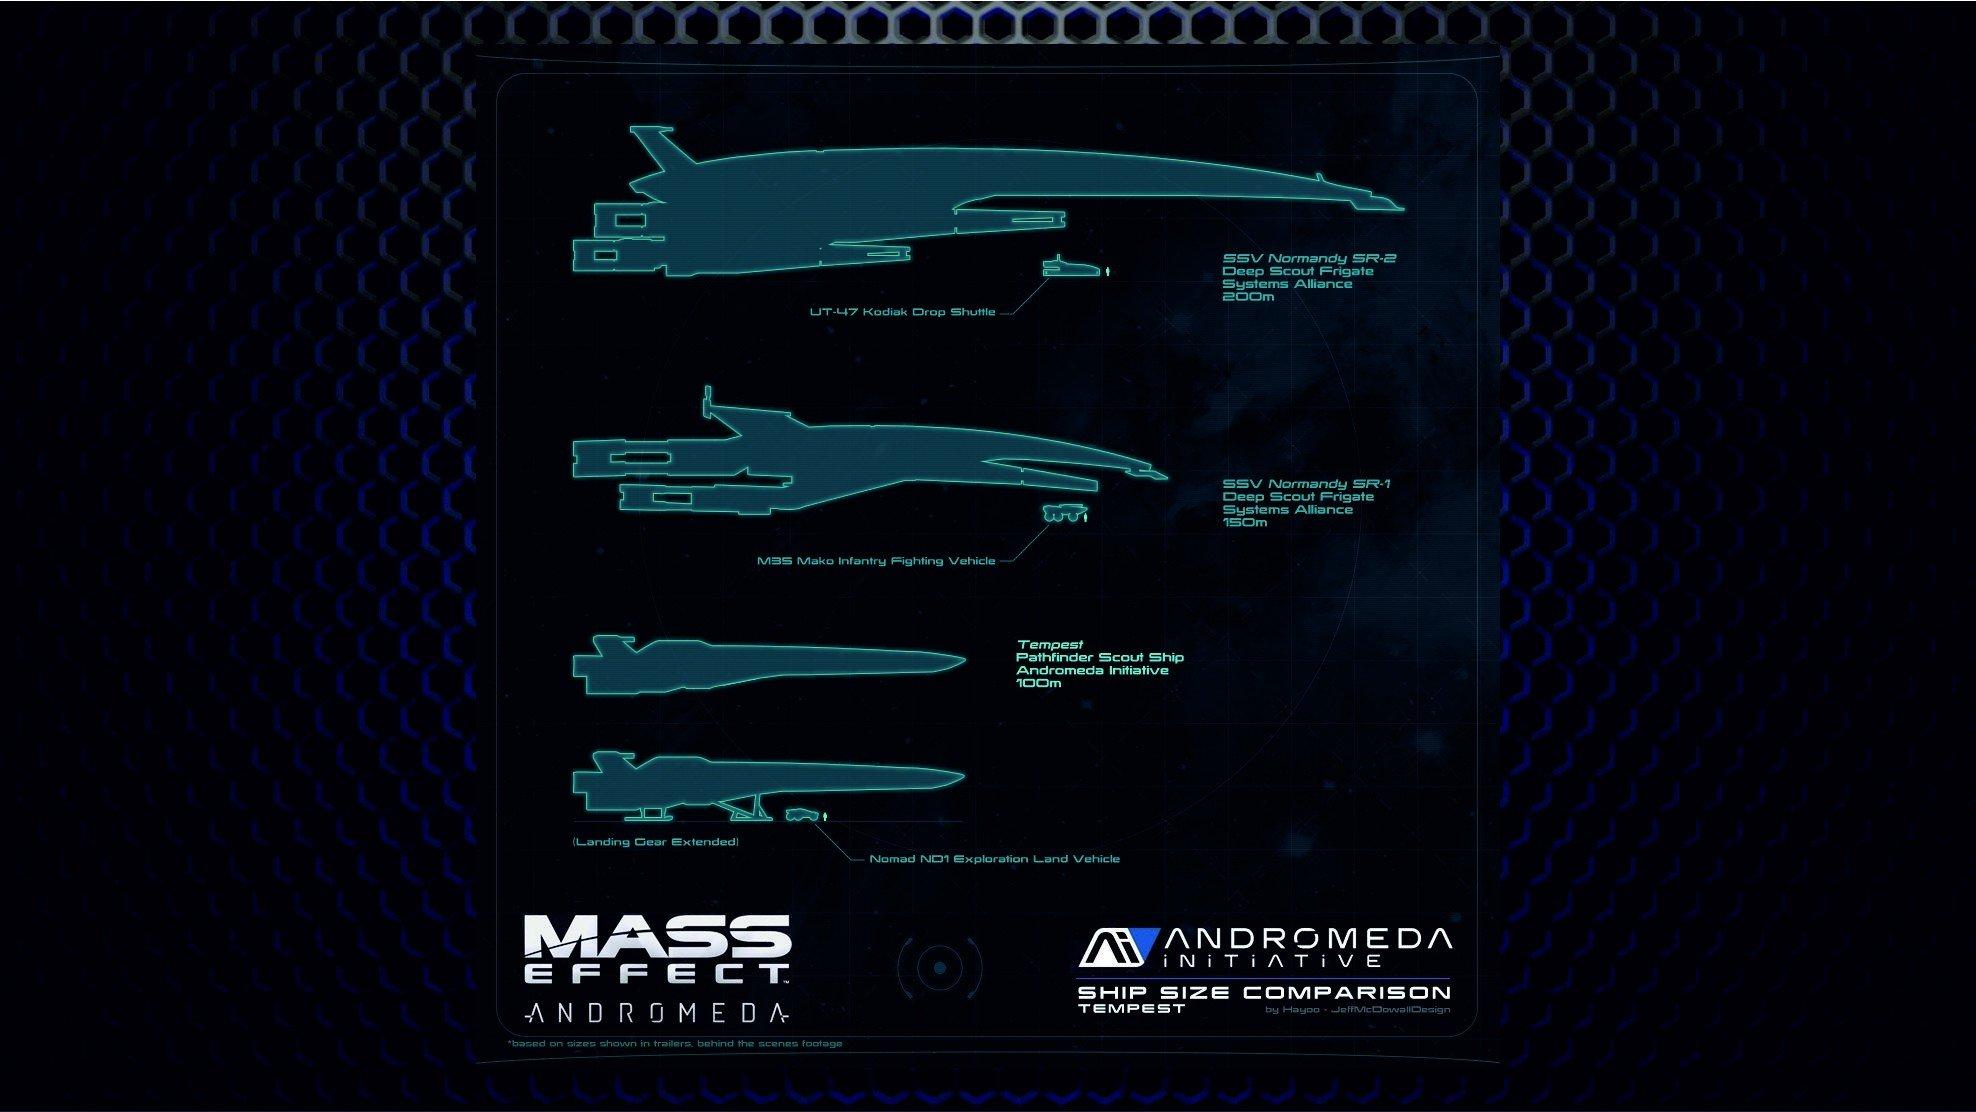 Andromeda Initiative Mass Effect Andromeda Video Games Hd